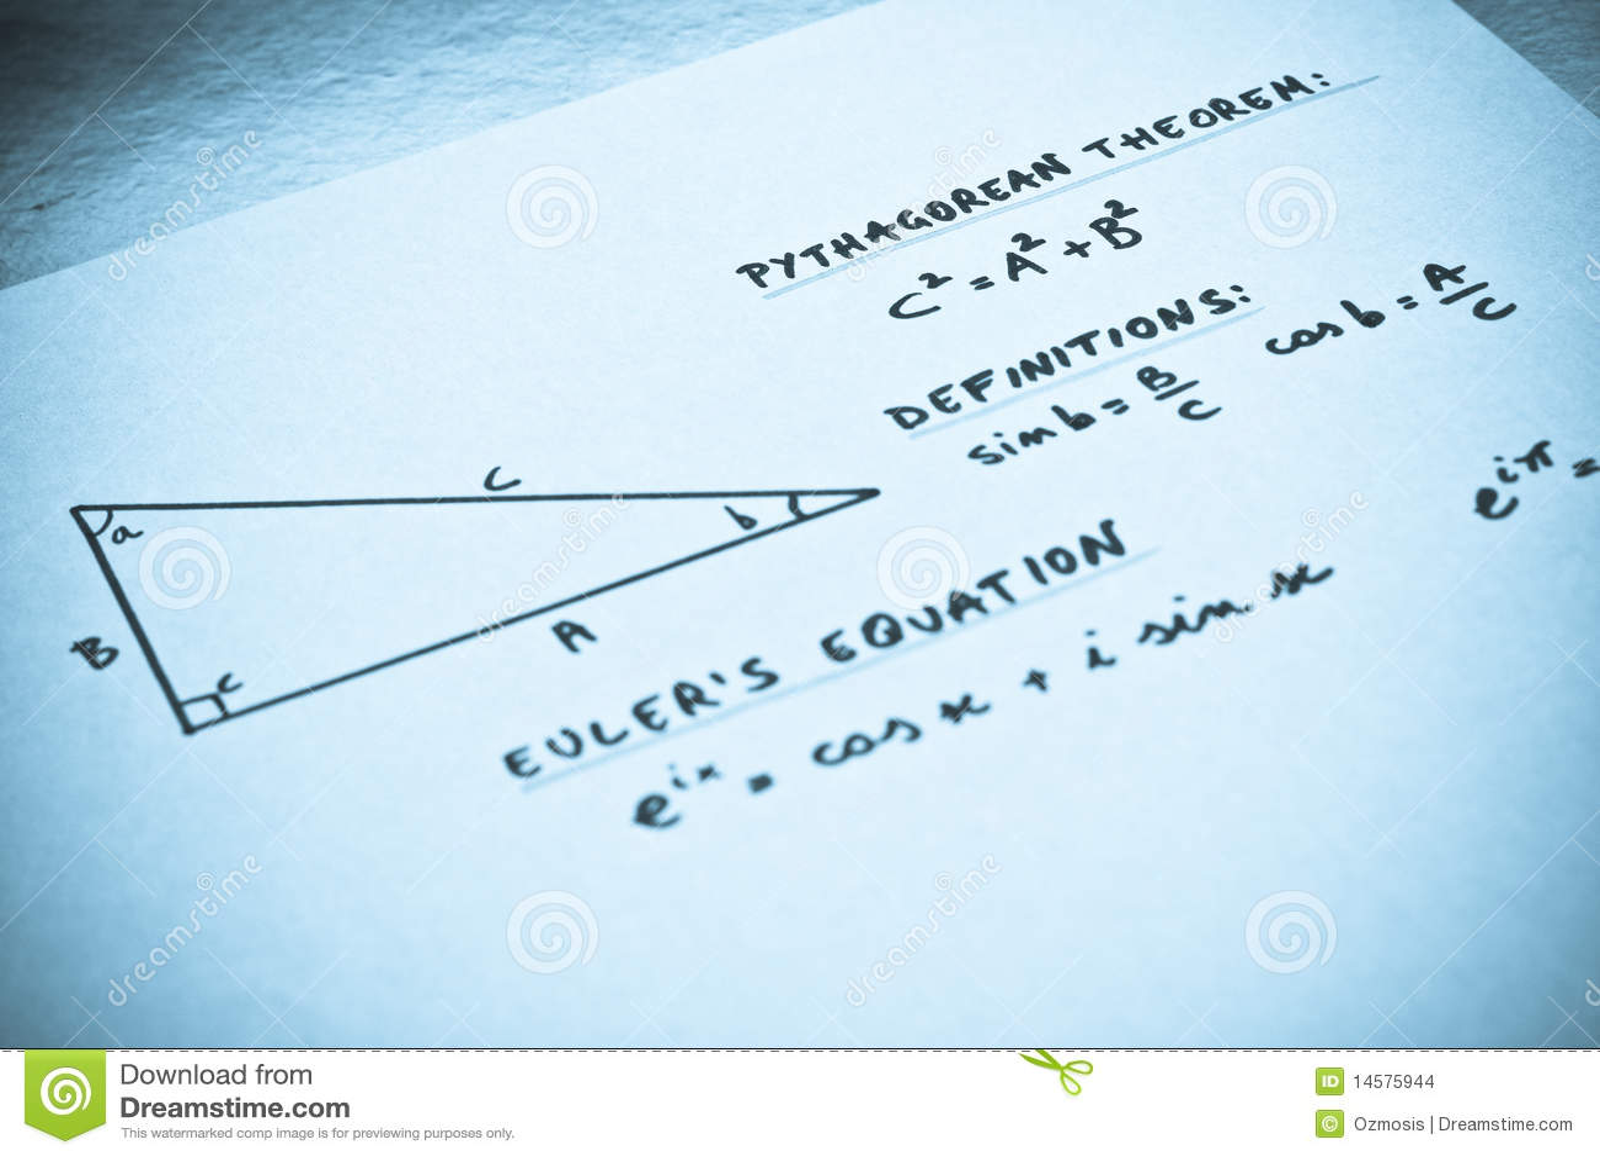 geometric formulas written on a white paper stock images image geometric formulas written on a white paper